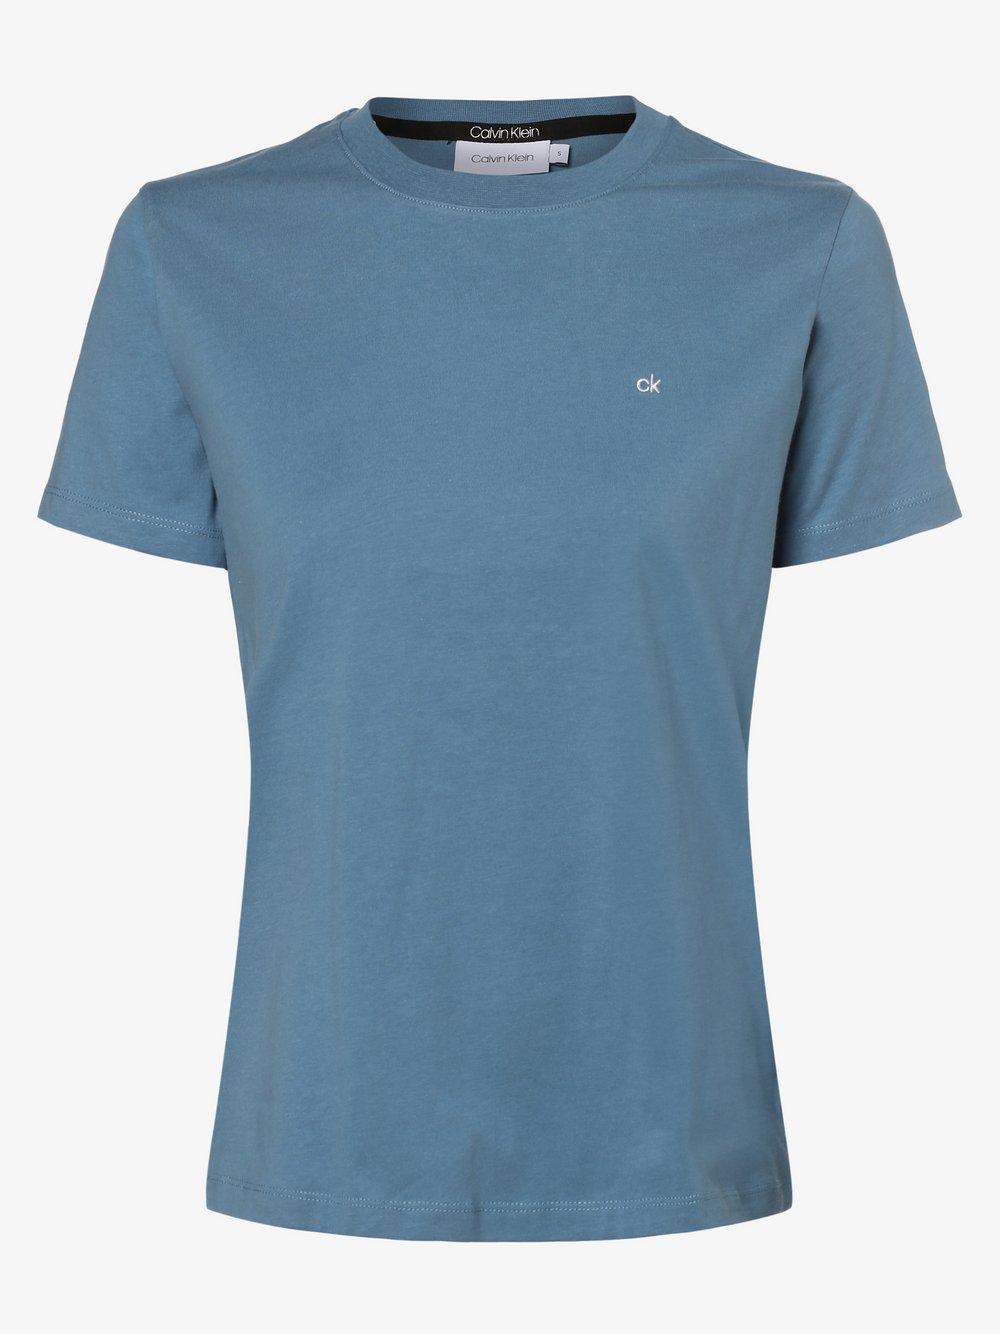 Calvin Klein - T-shirt damski, niebieski